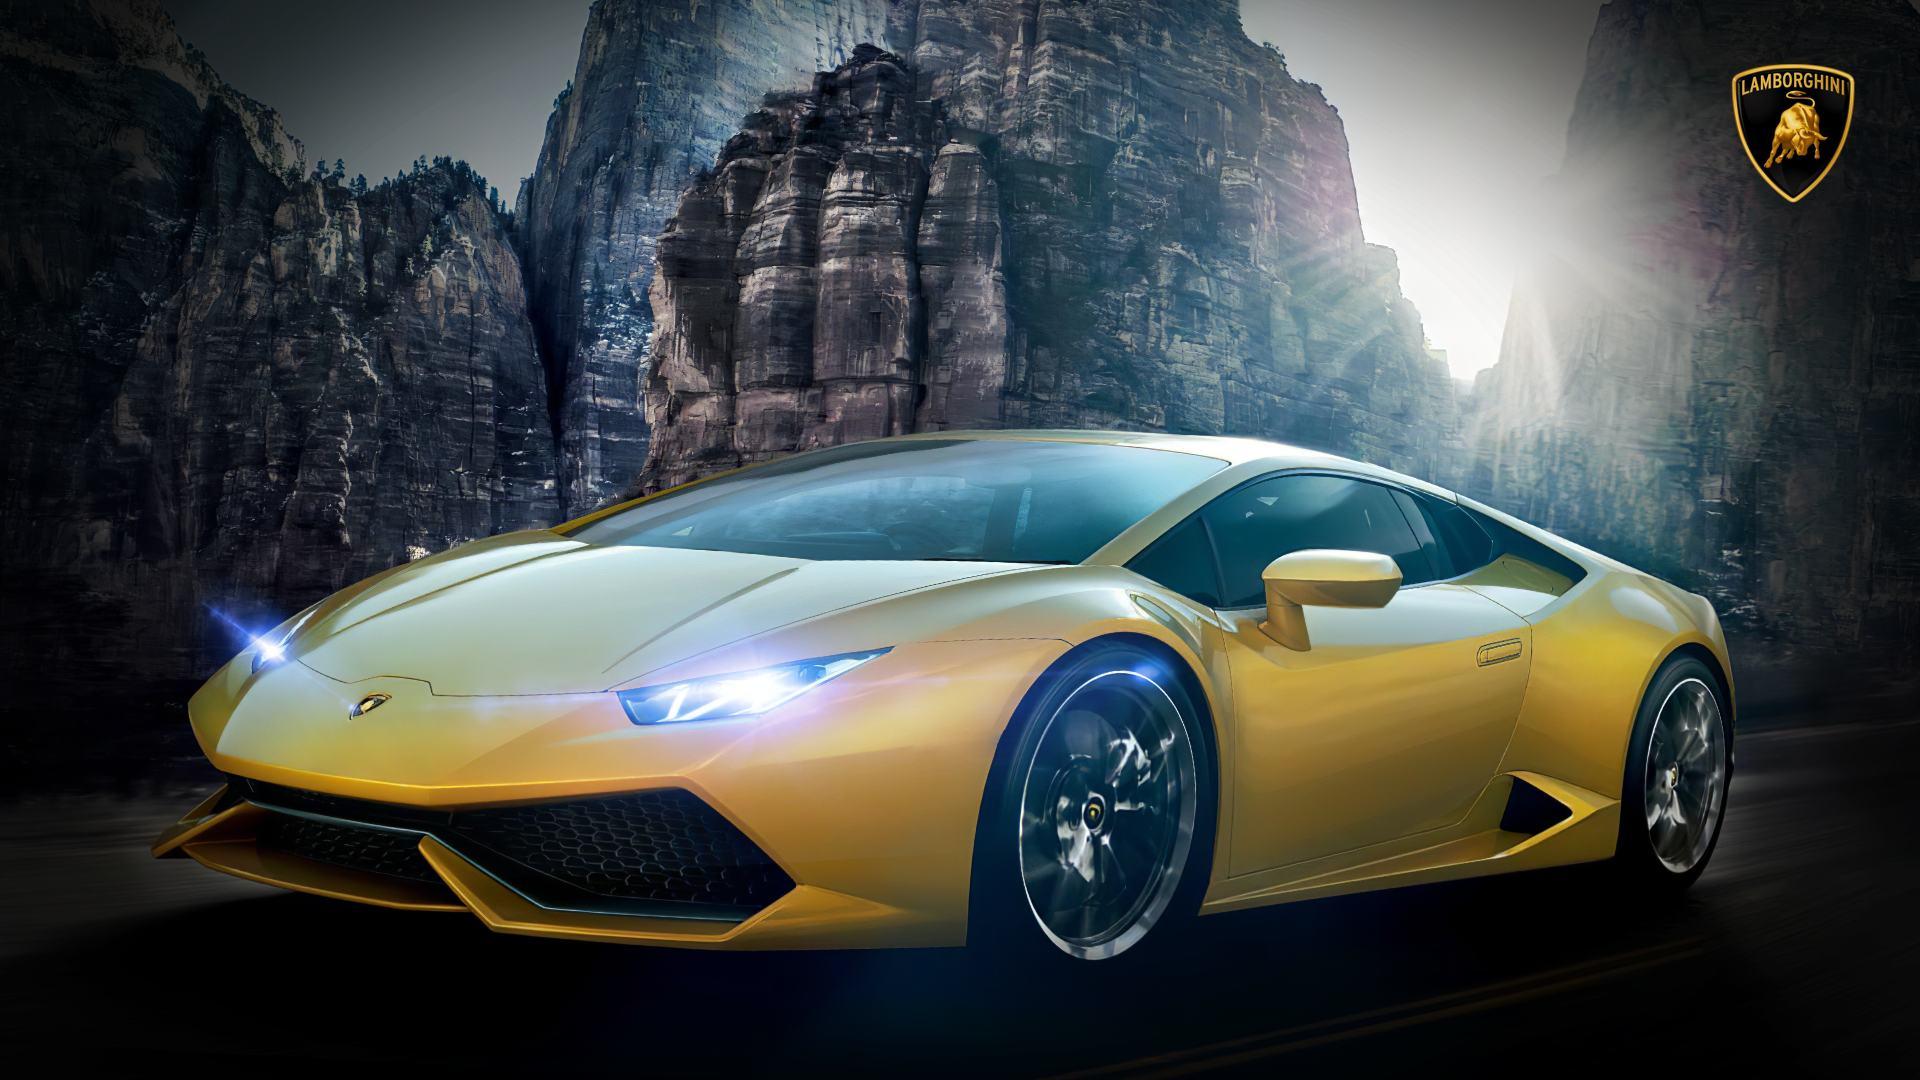 Sports Car Images of Lamborghini Wallpaper Hd